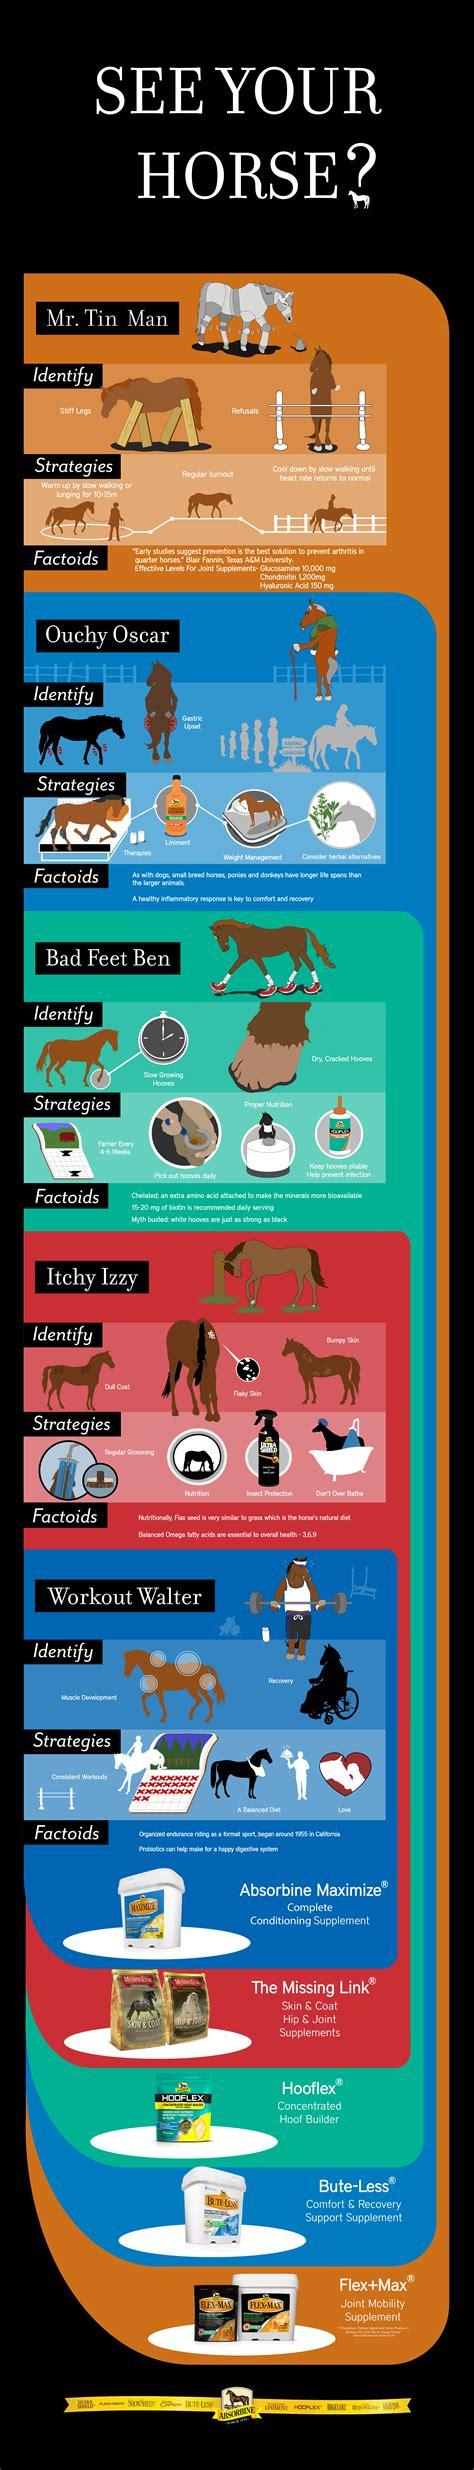 horse supplements horses